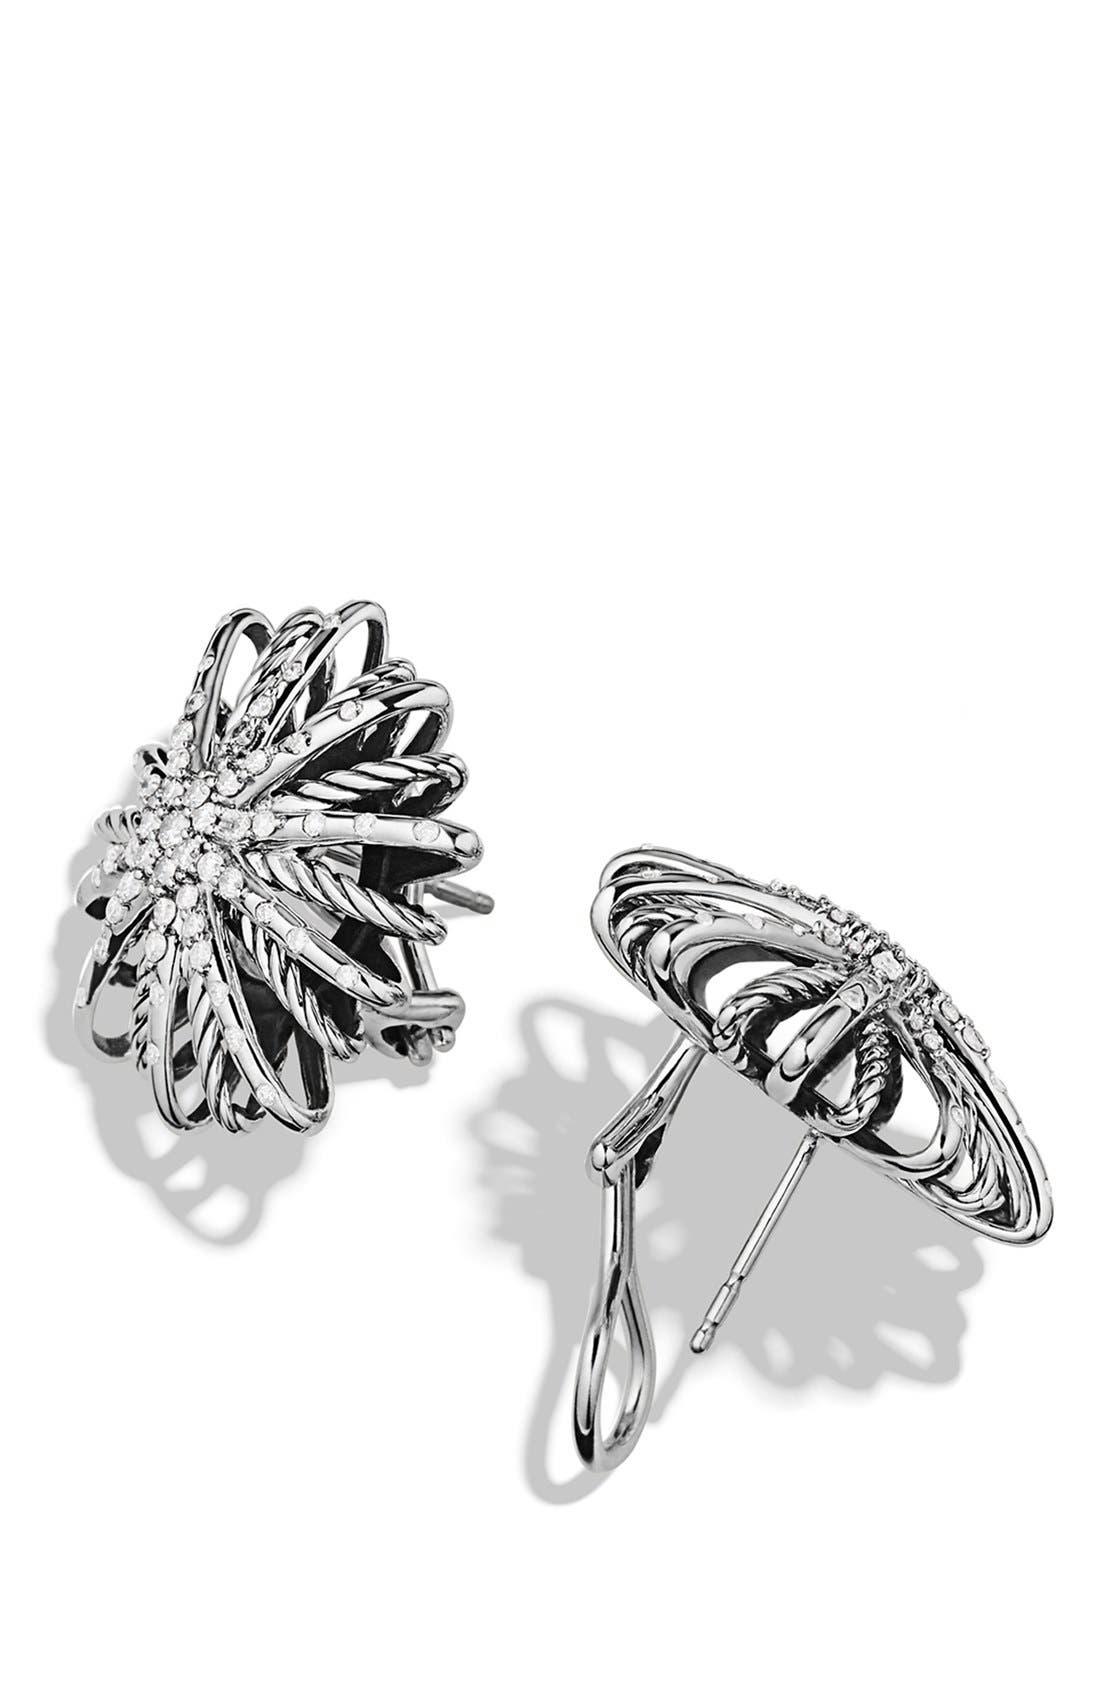 Alternate Image 2  - David Yurman 'Starburst' Earrings with Diamonds